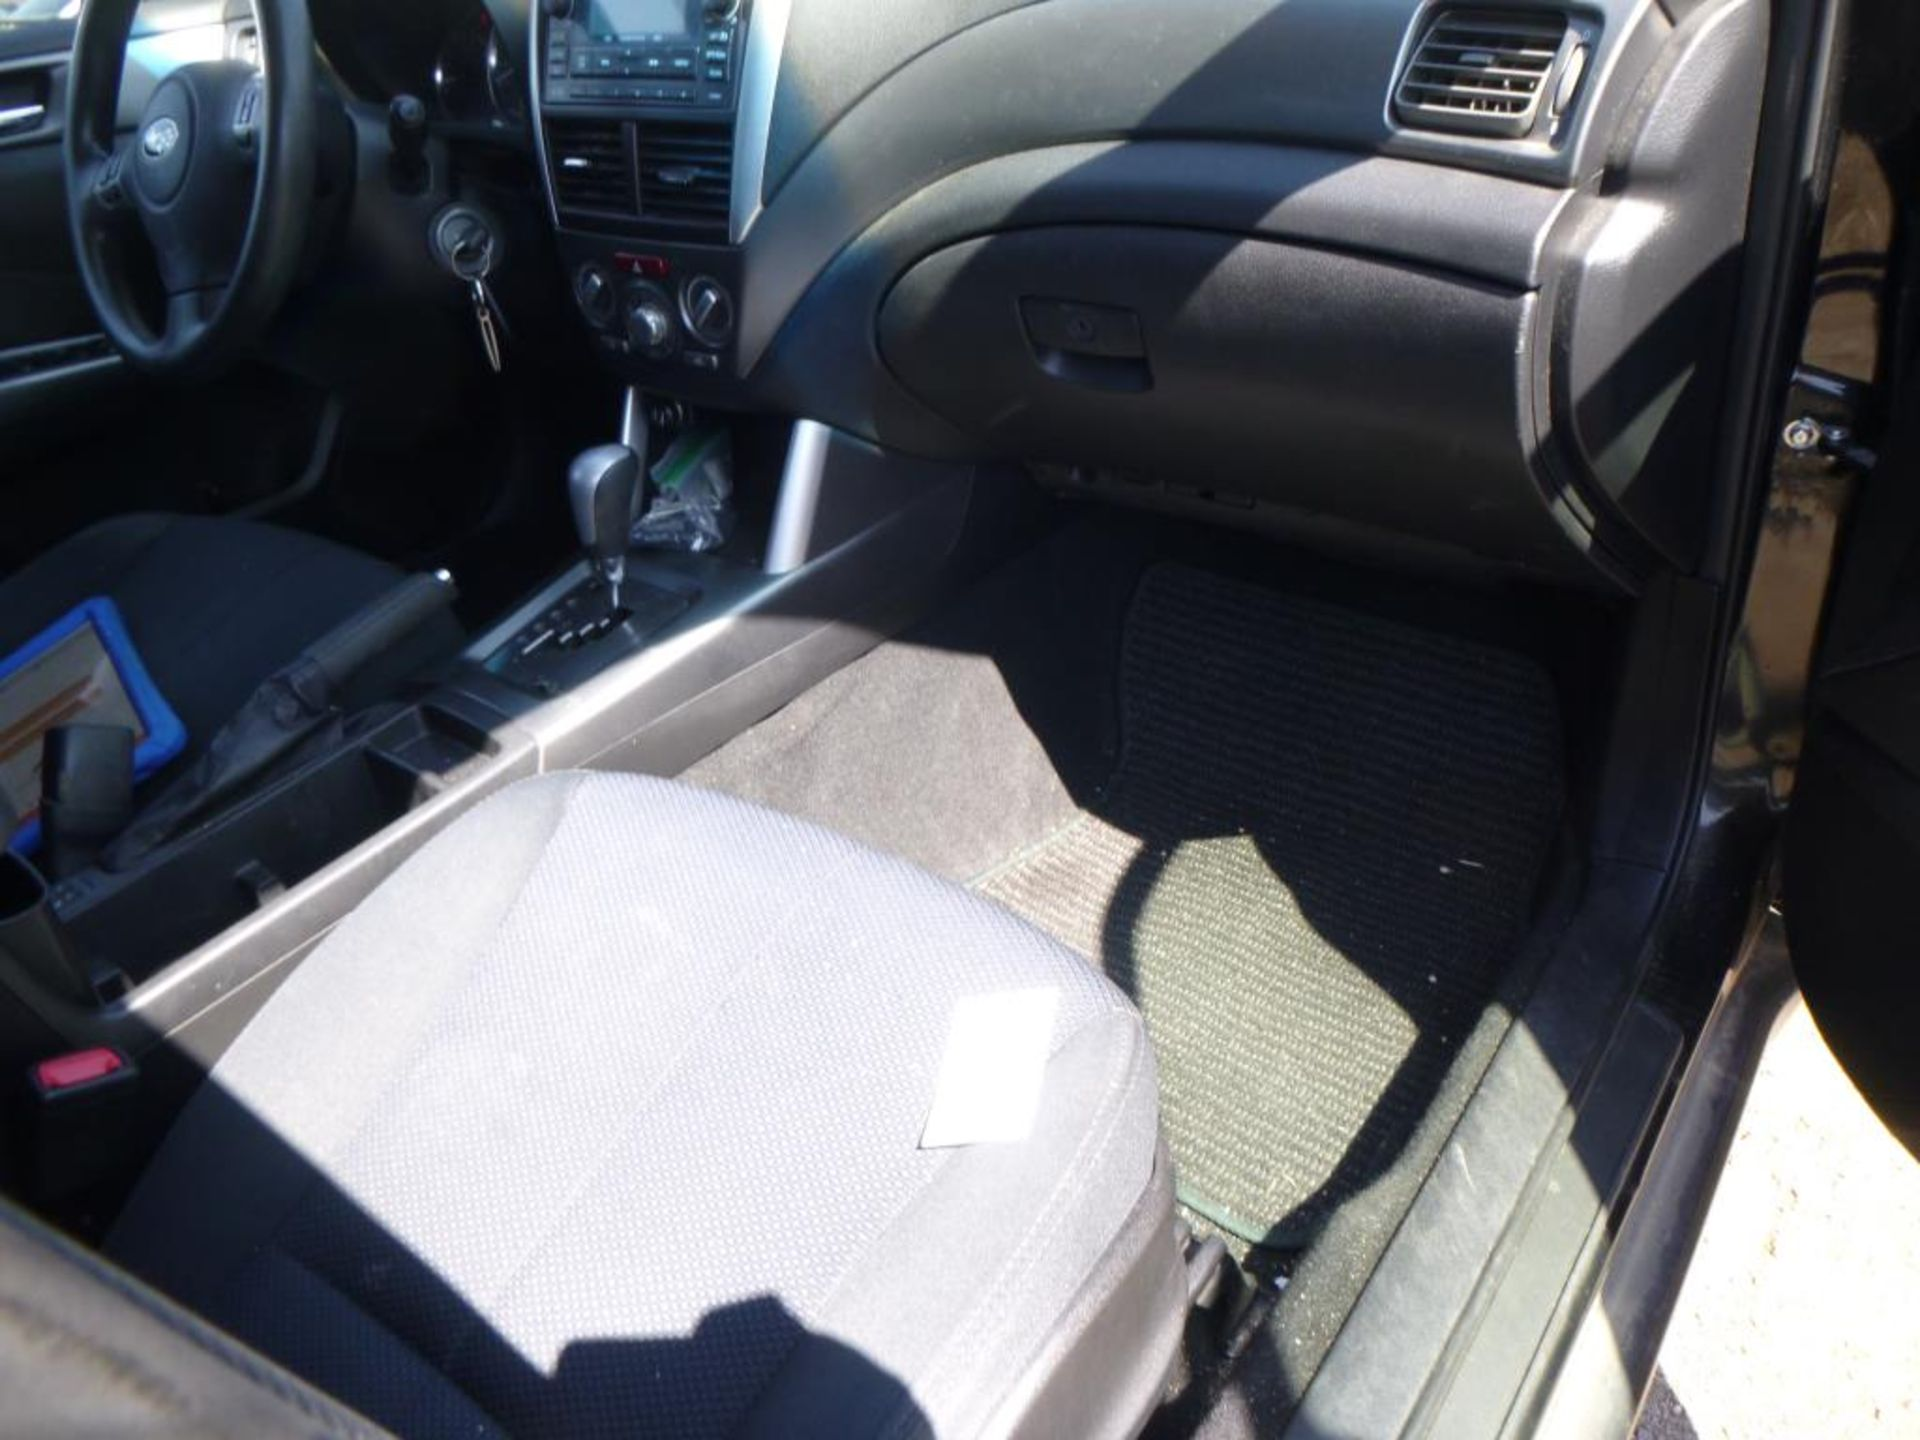 2011 Subaru Forester - Image 6 of 11